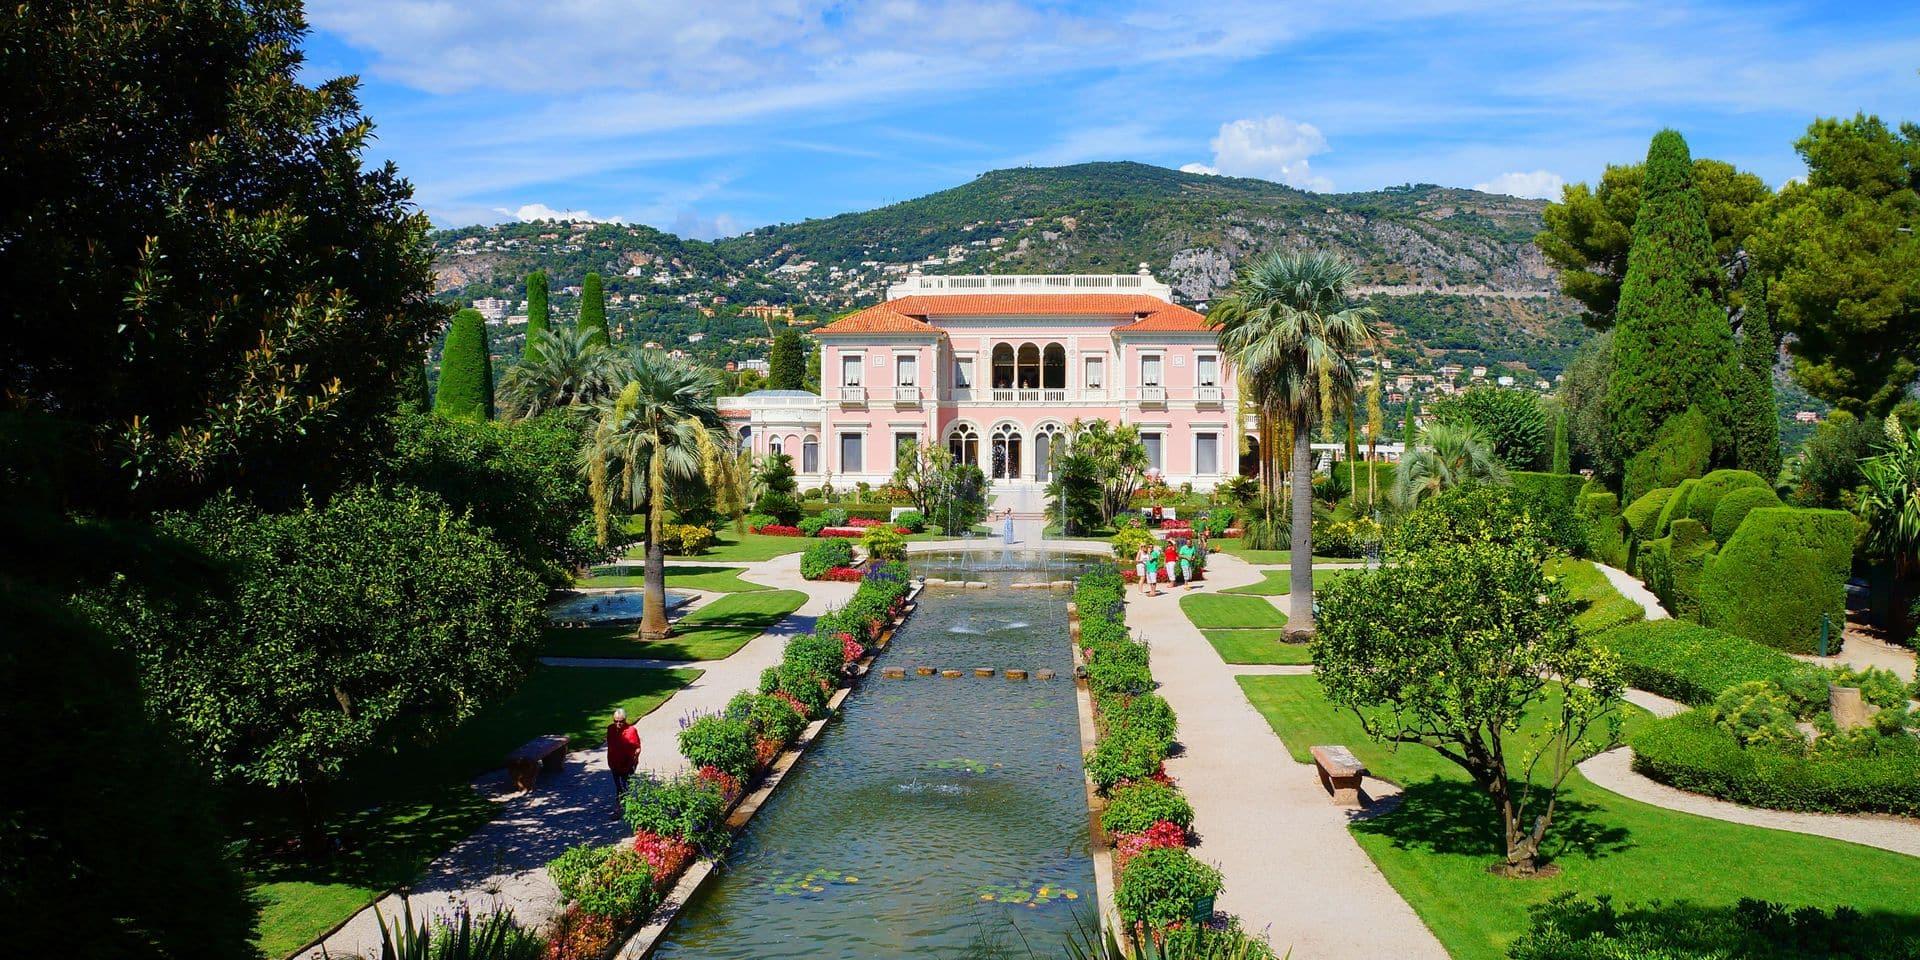 Villa,Ephrussi,De,Rothschild,And,Gardens,On,The,French,Riviera.